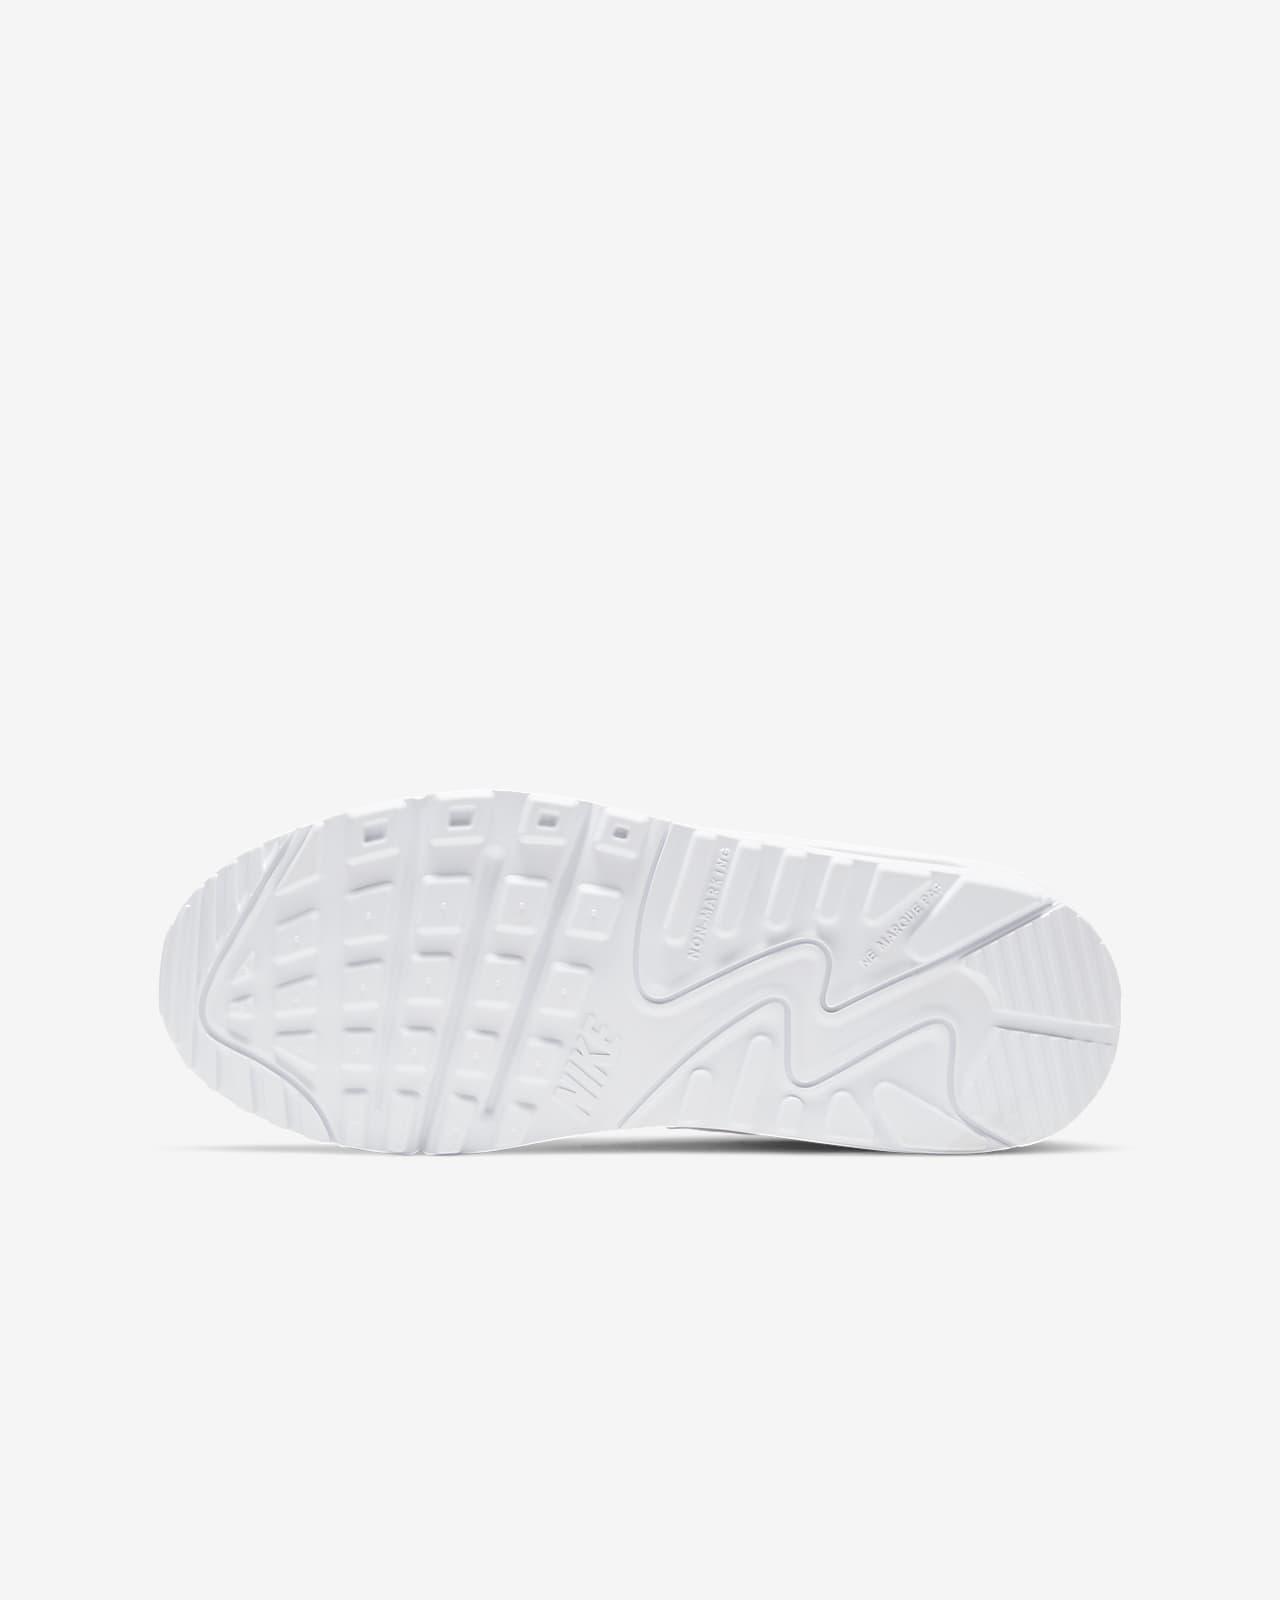 Acostumbrarse a Inconsciente Reembolso  Nike Air Max 90 LTR Zapatillas - Niño/a. Nike ES